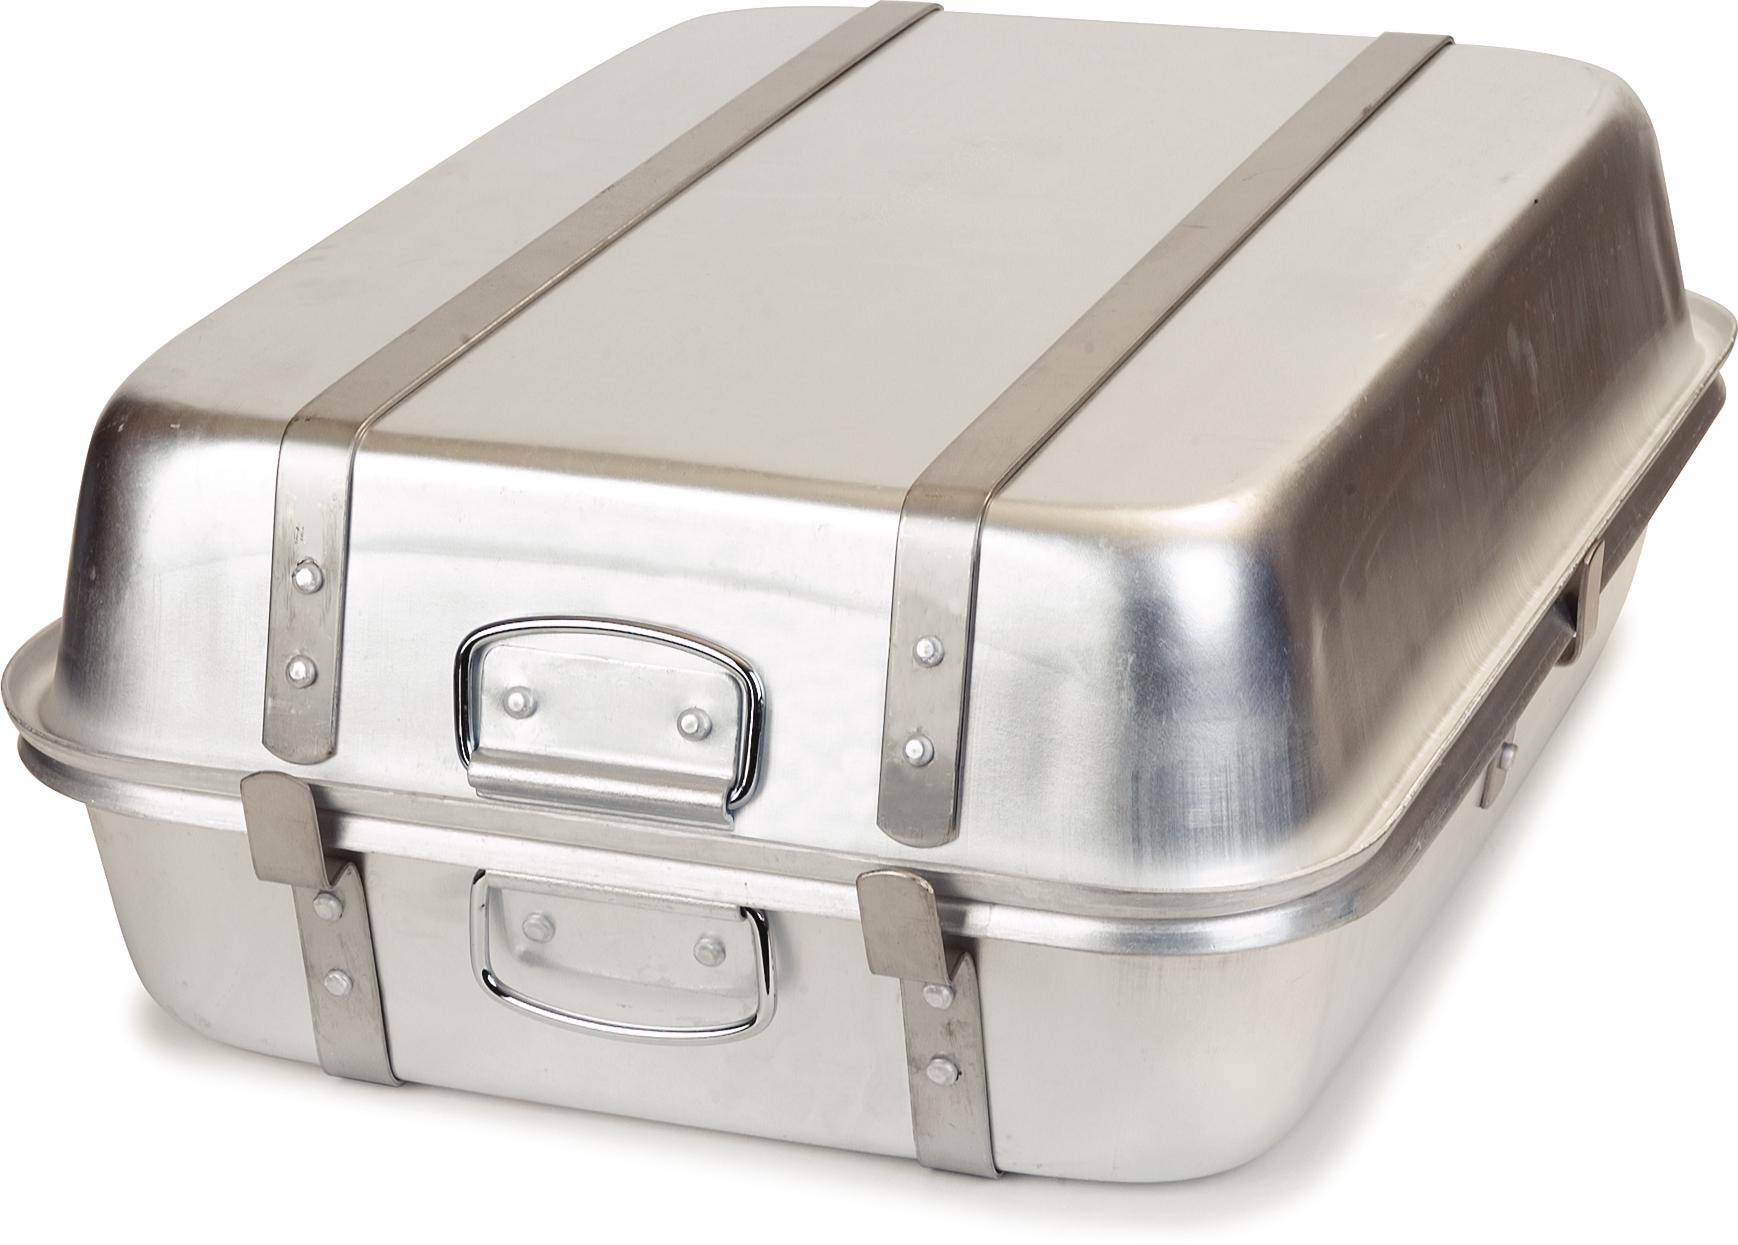 Double Roaster 24 x 18 x 9 - Aluminum